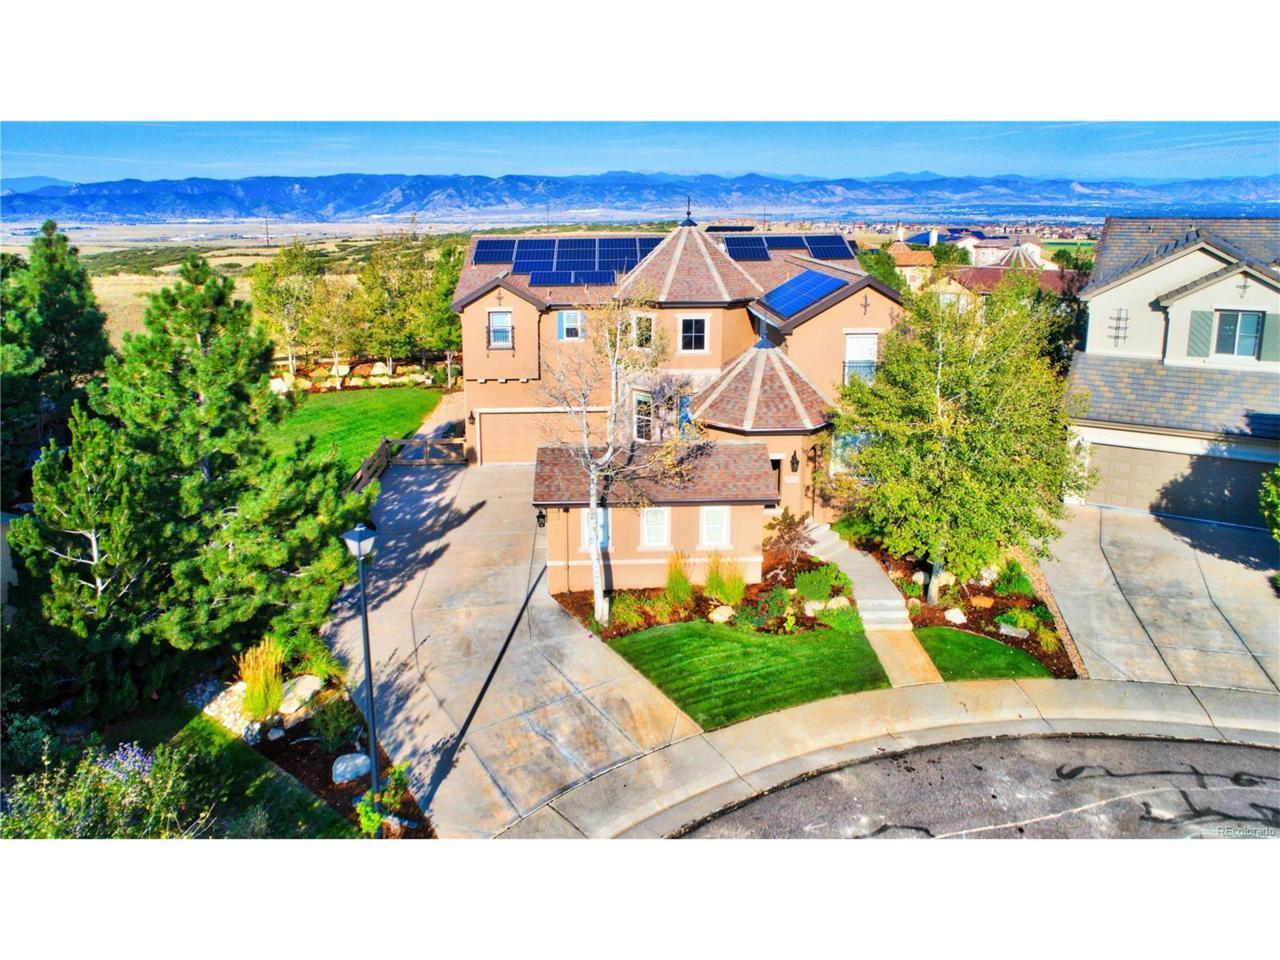 2636 Danbury Avenue, Highlands Ranch, CO 80126 (MLS #7472757) :: 8z Real Estate